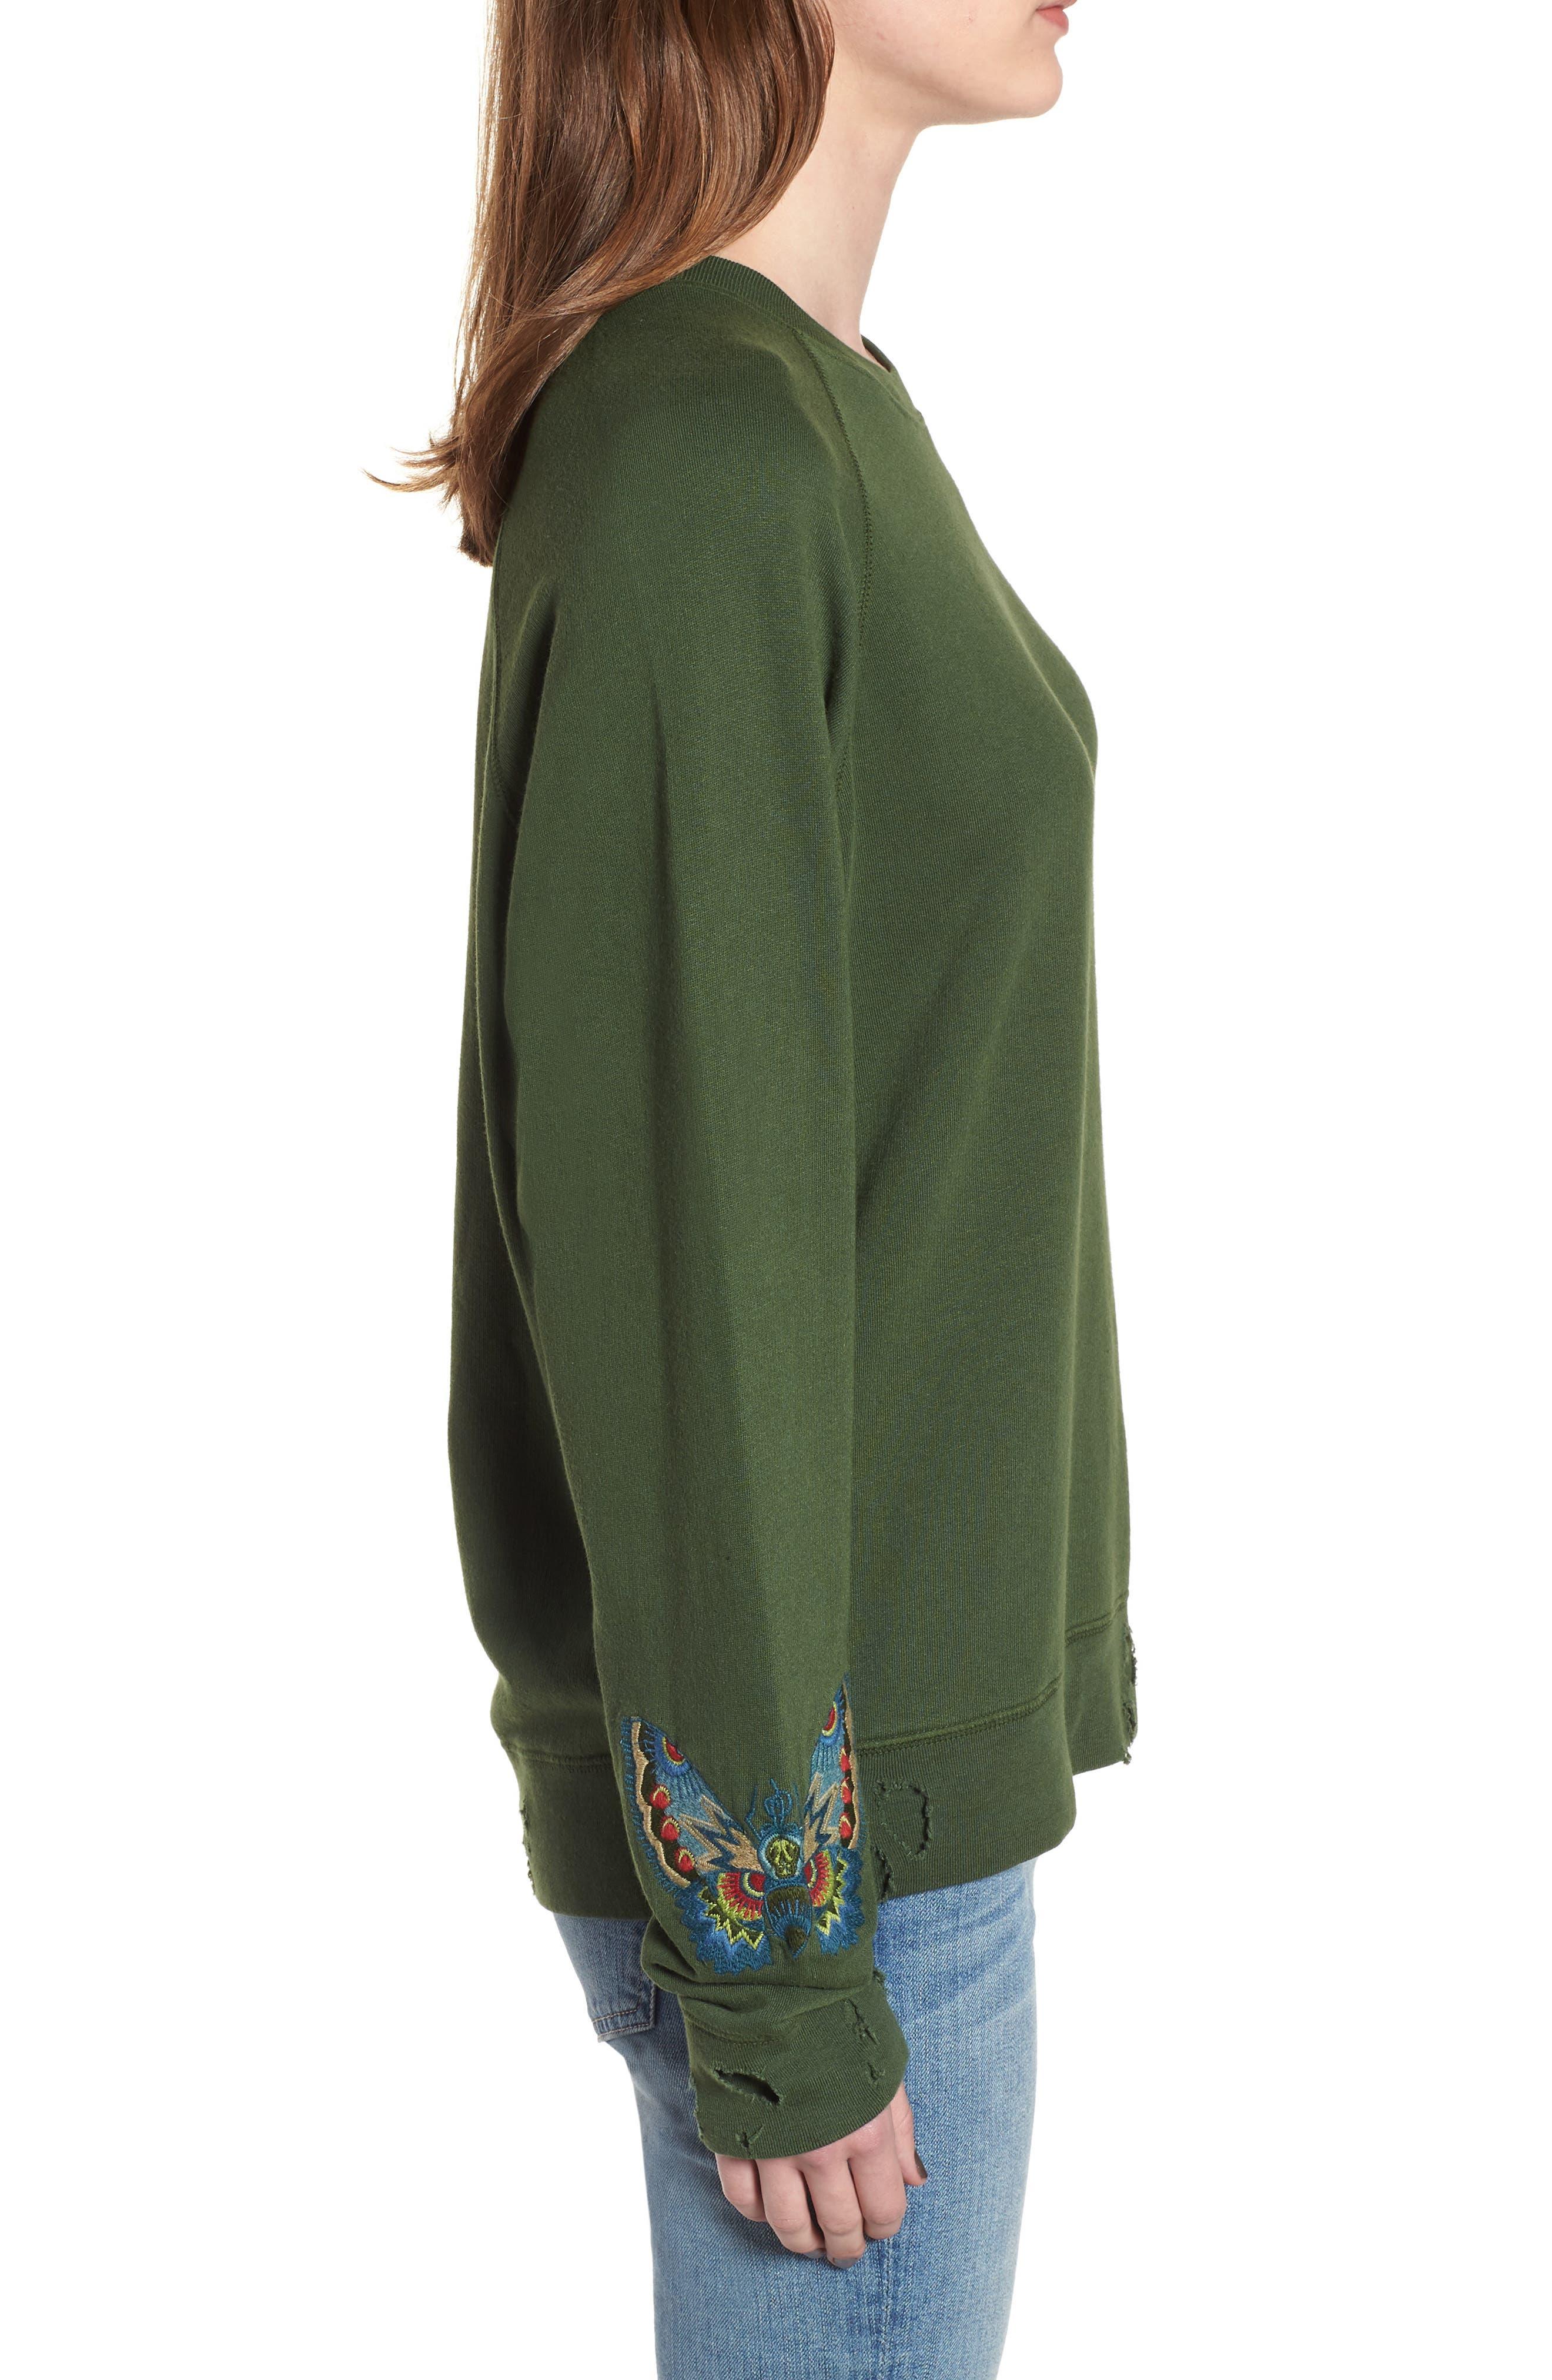 Upper Bis Brode Sweatshirt,                             Alternate thumbnail 3, color,                             340